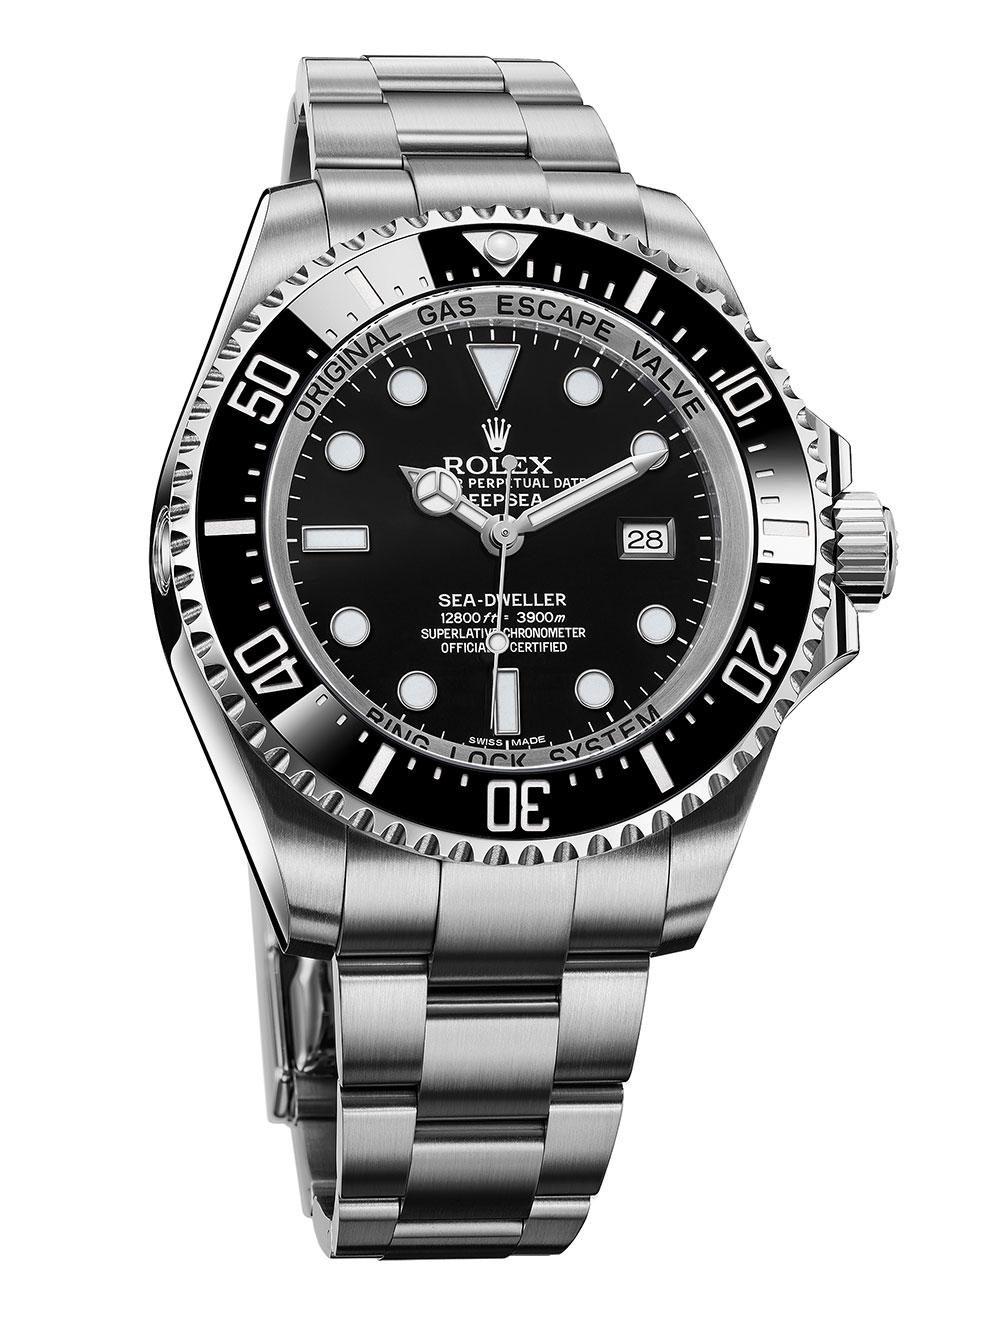 KURY Alta Relojeria in Plaza las Americas carries elegant timepieces like Rolex and Breitling.